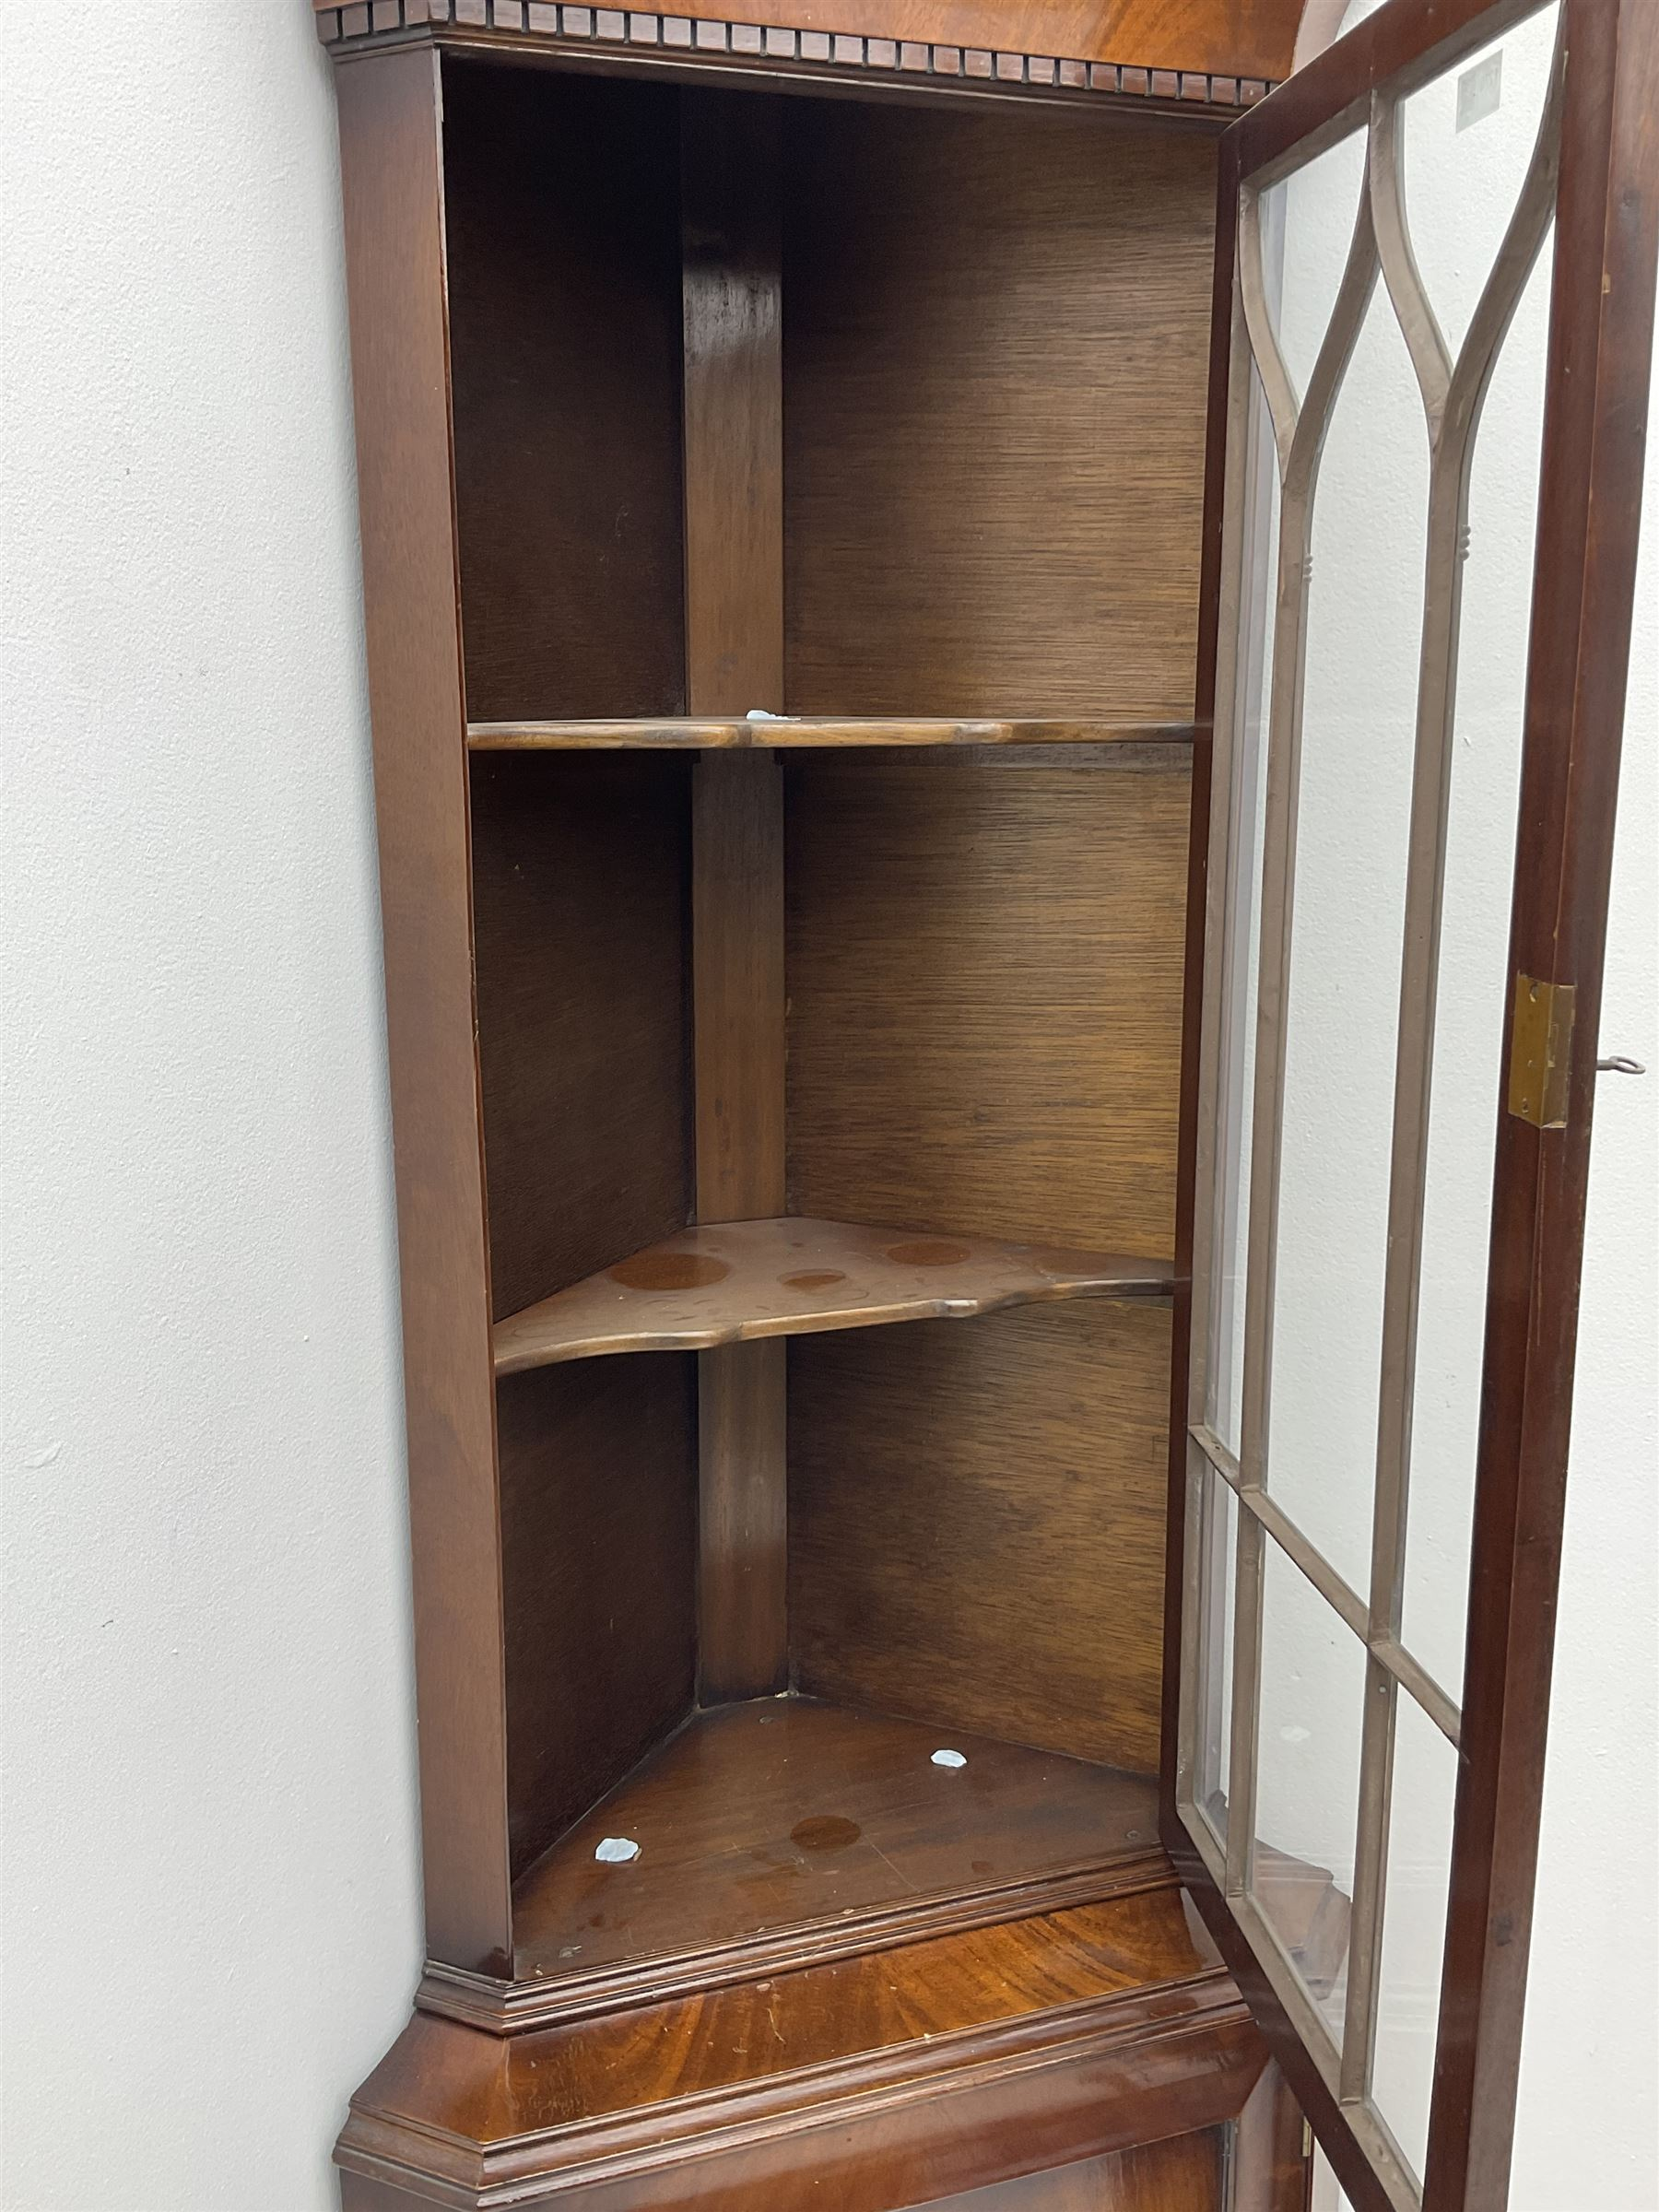 Late 20th century mahogany corner display cabinet - Image 2 of 2